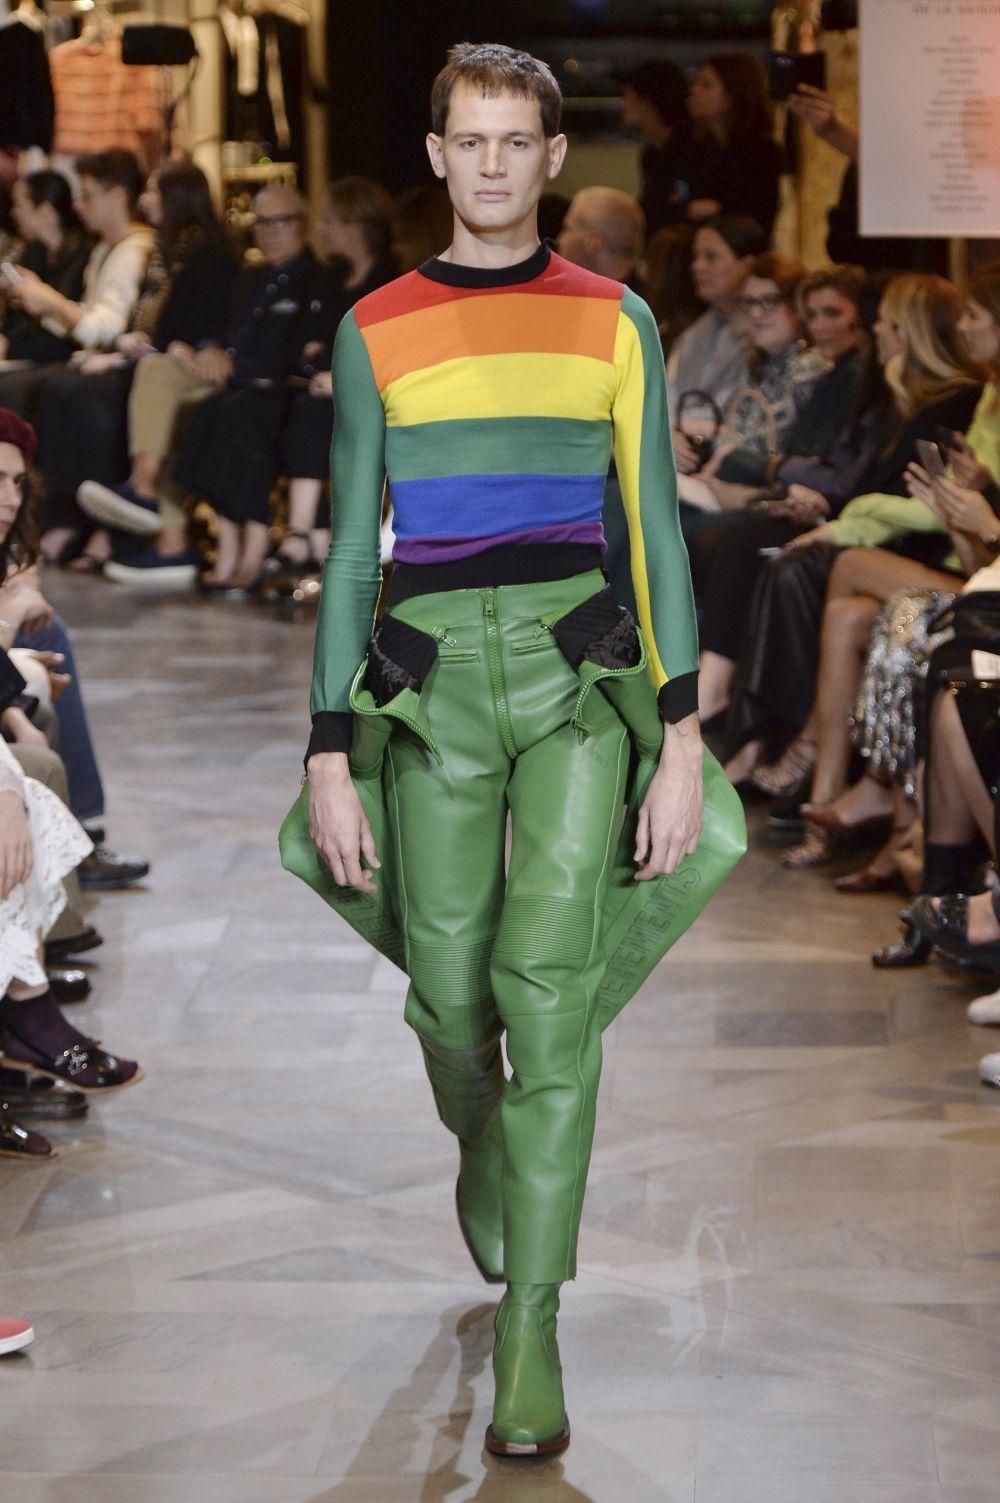 Modelo de la firma de moda Vetements